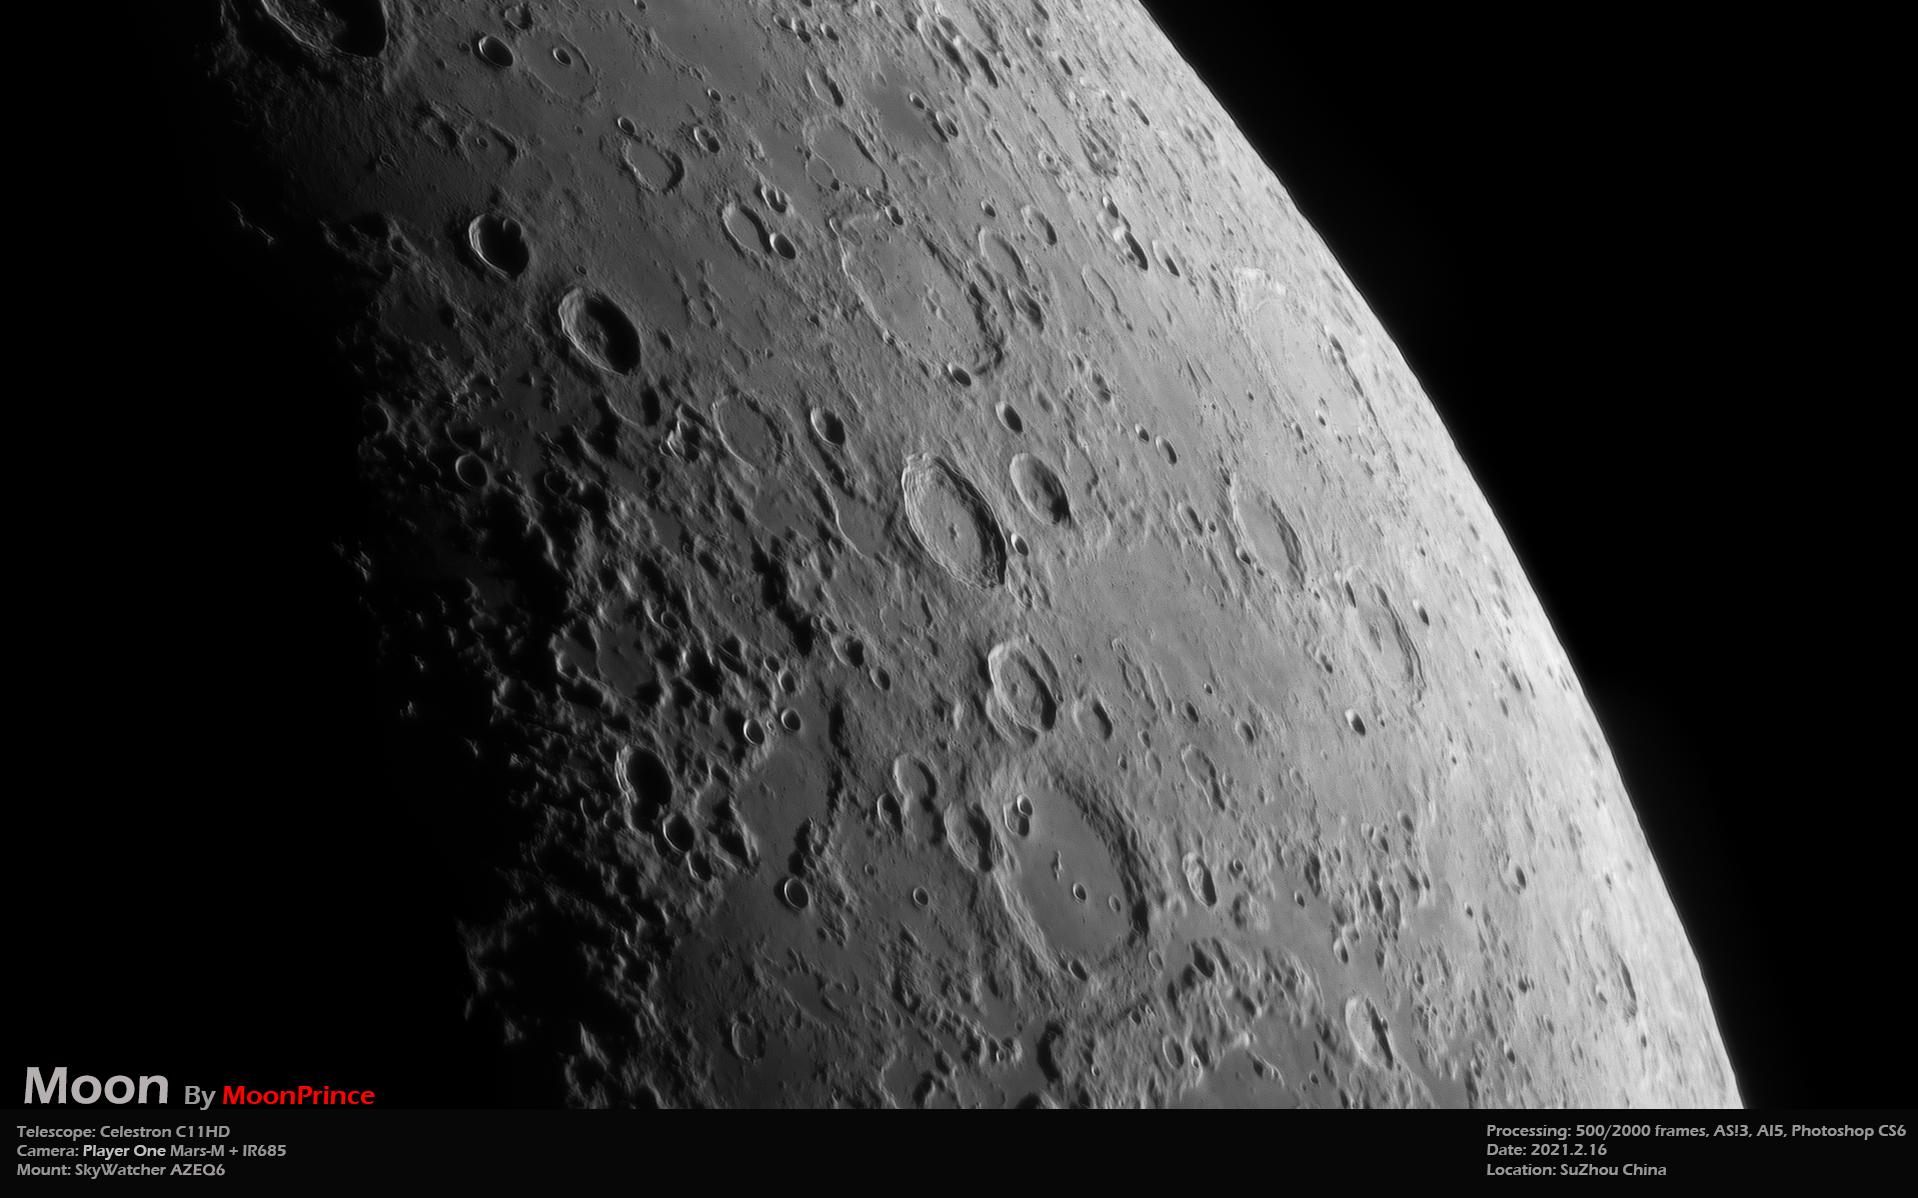 Moon20210216-S3.jpg